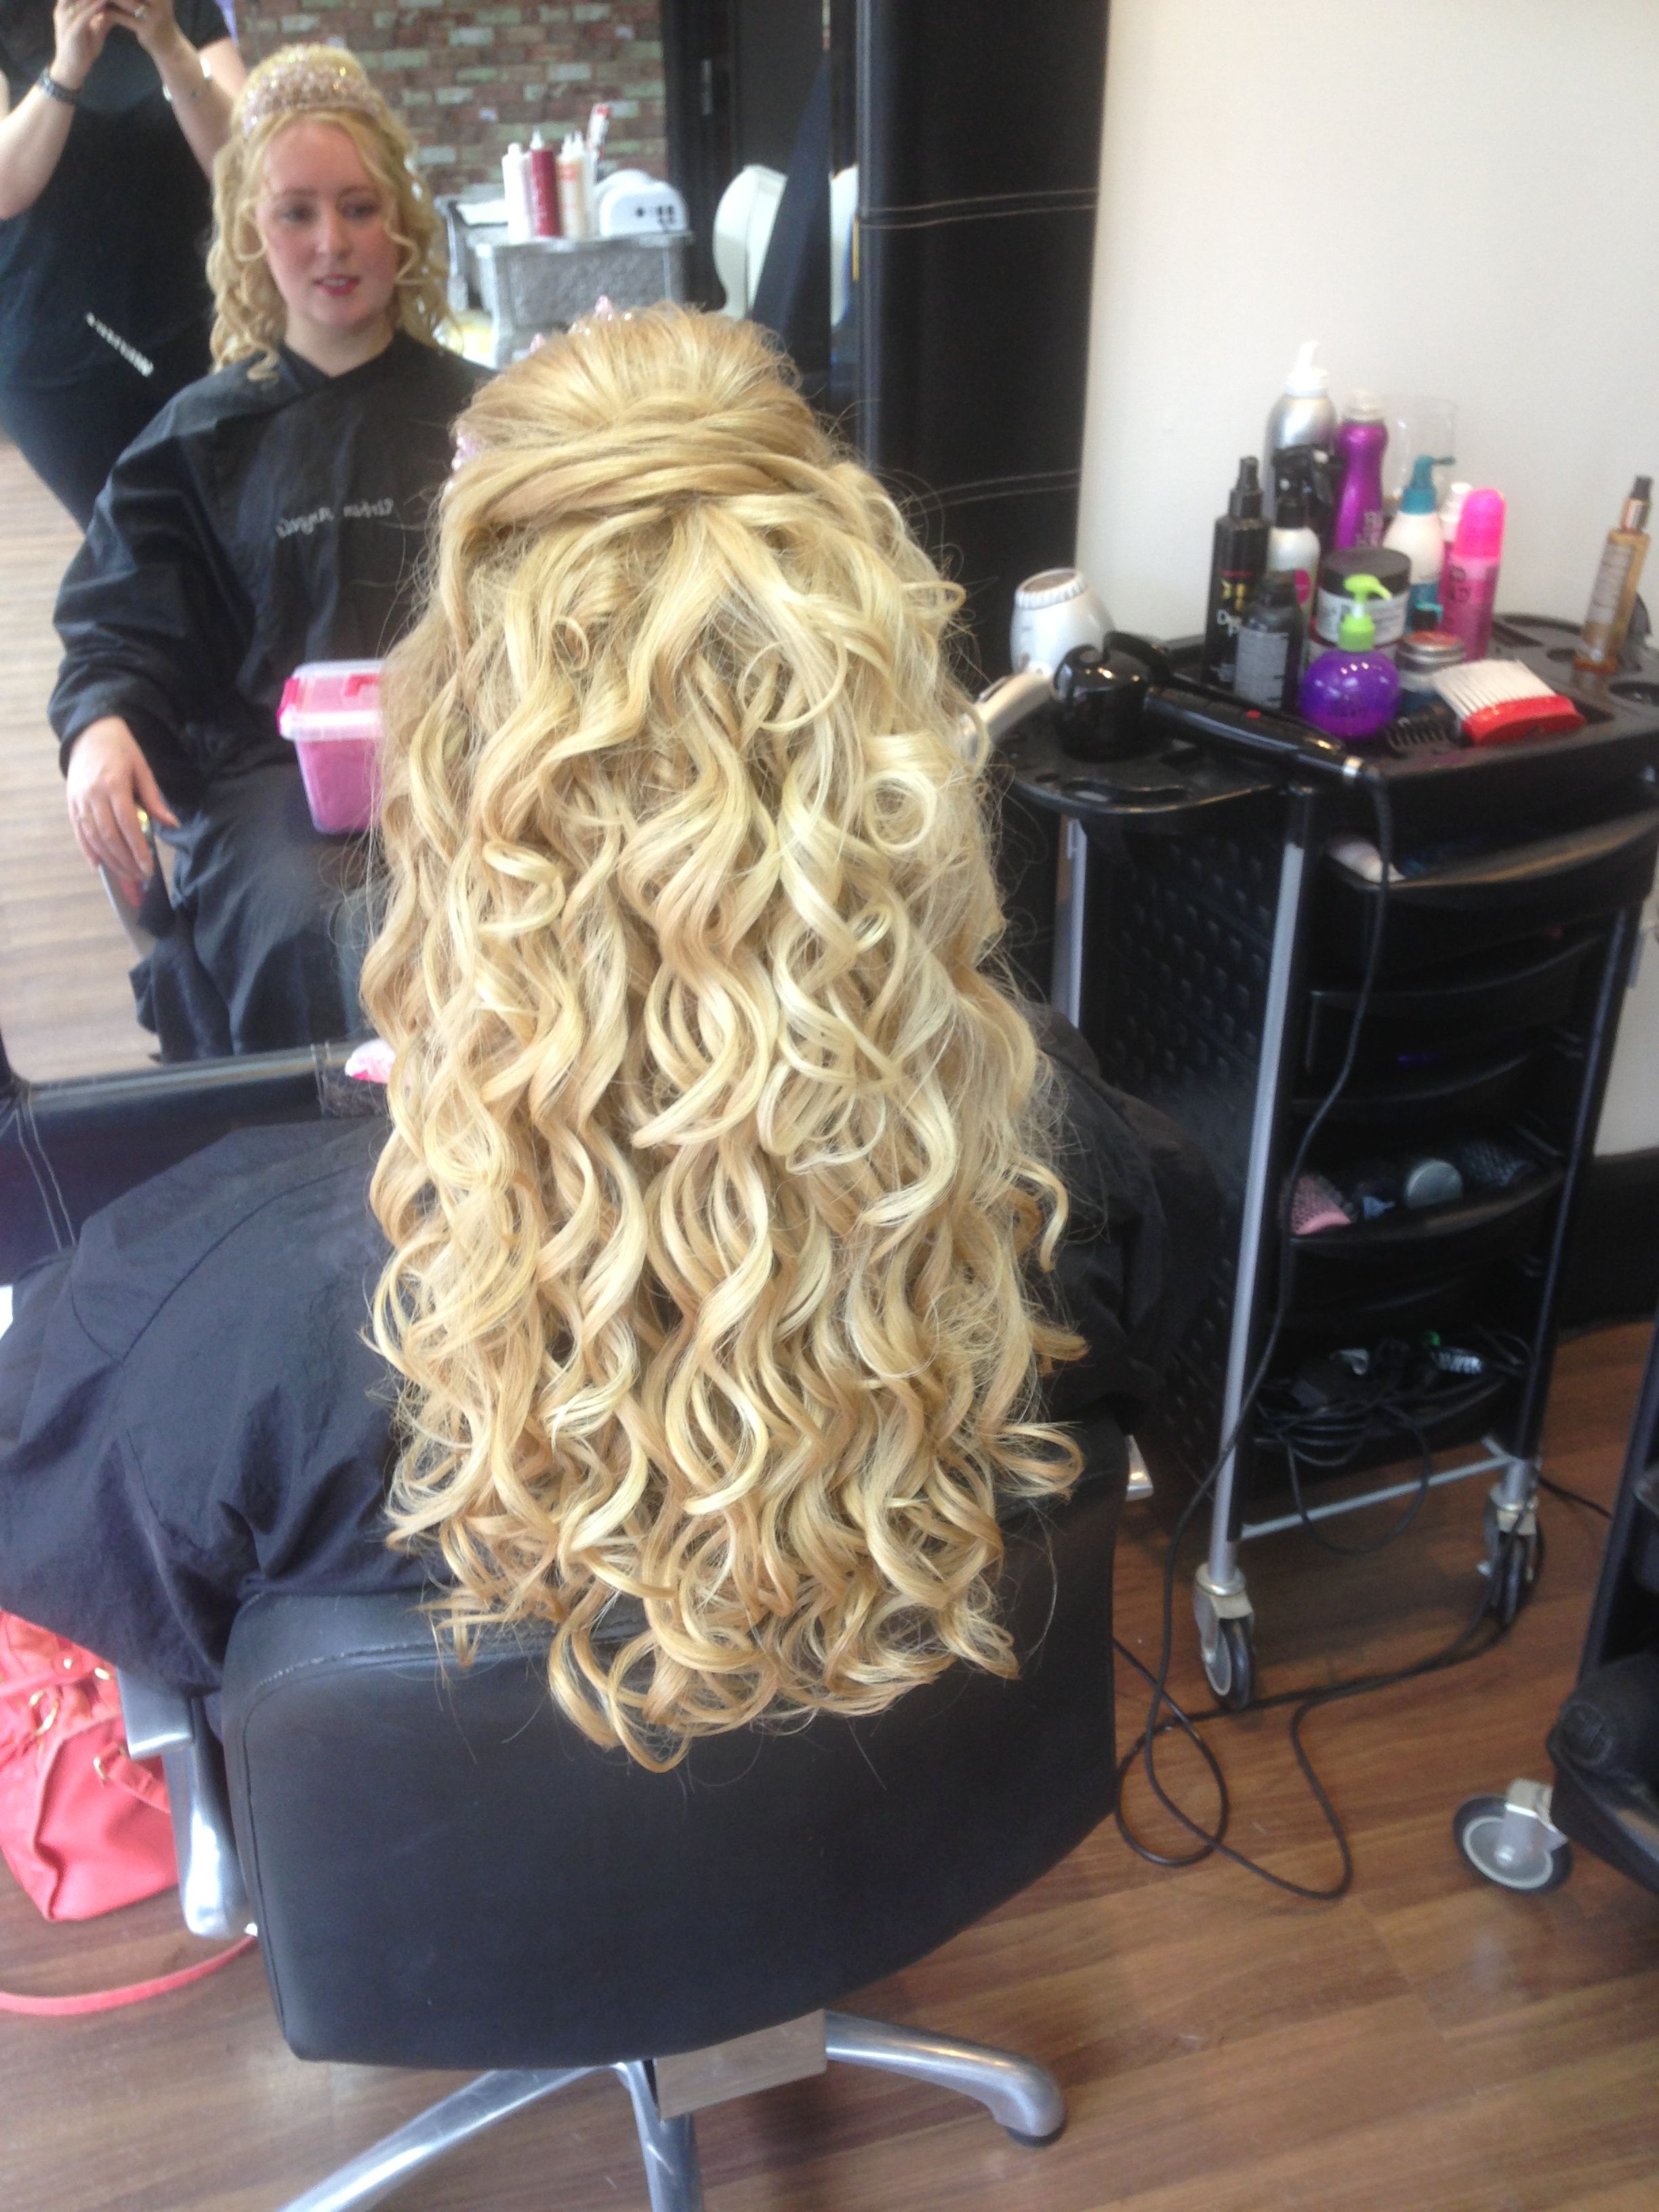 wedding hair #curly #half-up #blonde #wedding | wedding